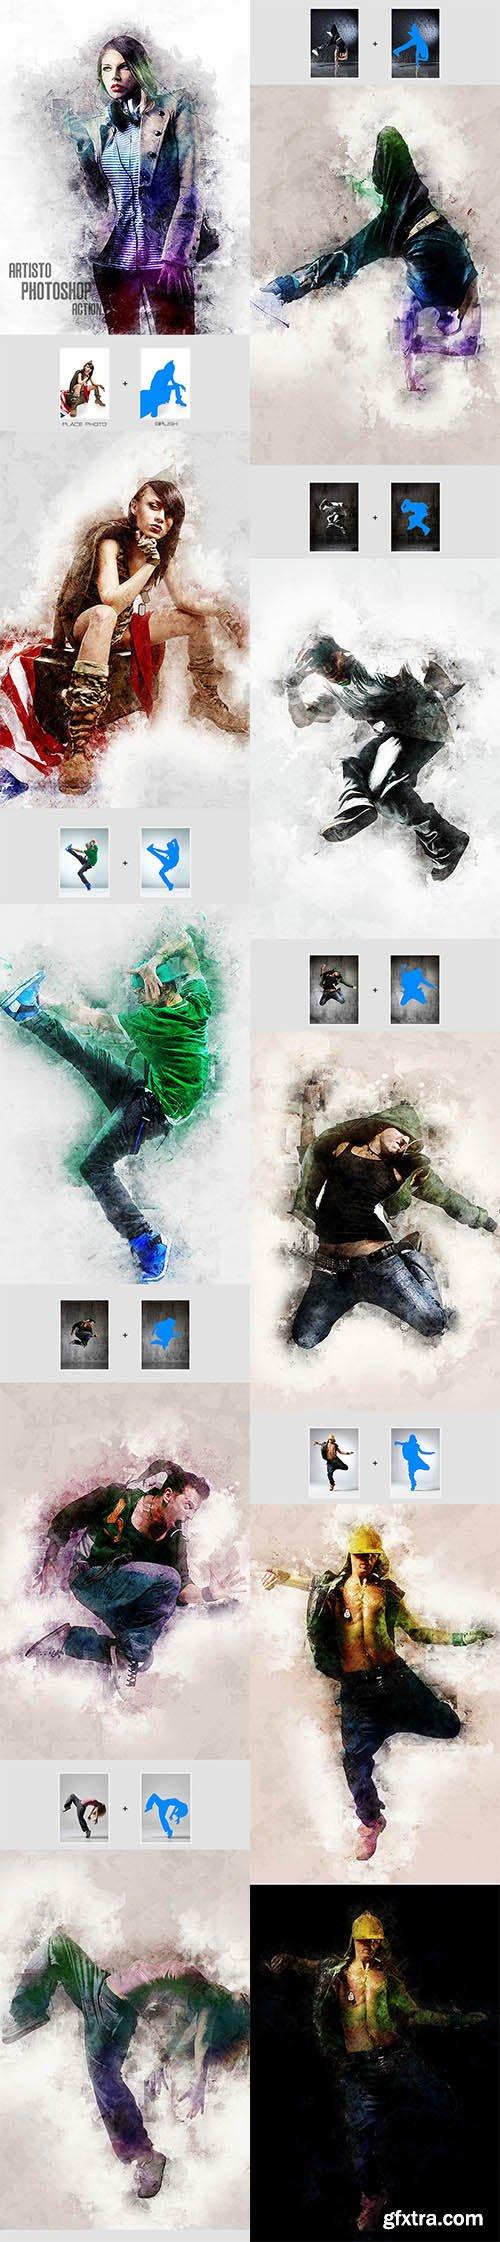 Graphicriver  Artisto - Photoshop Action 12390526